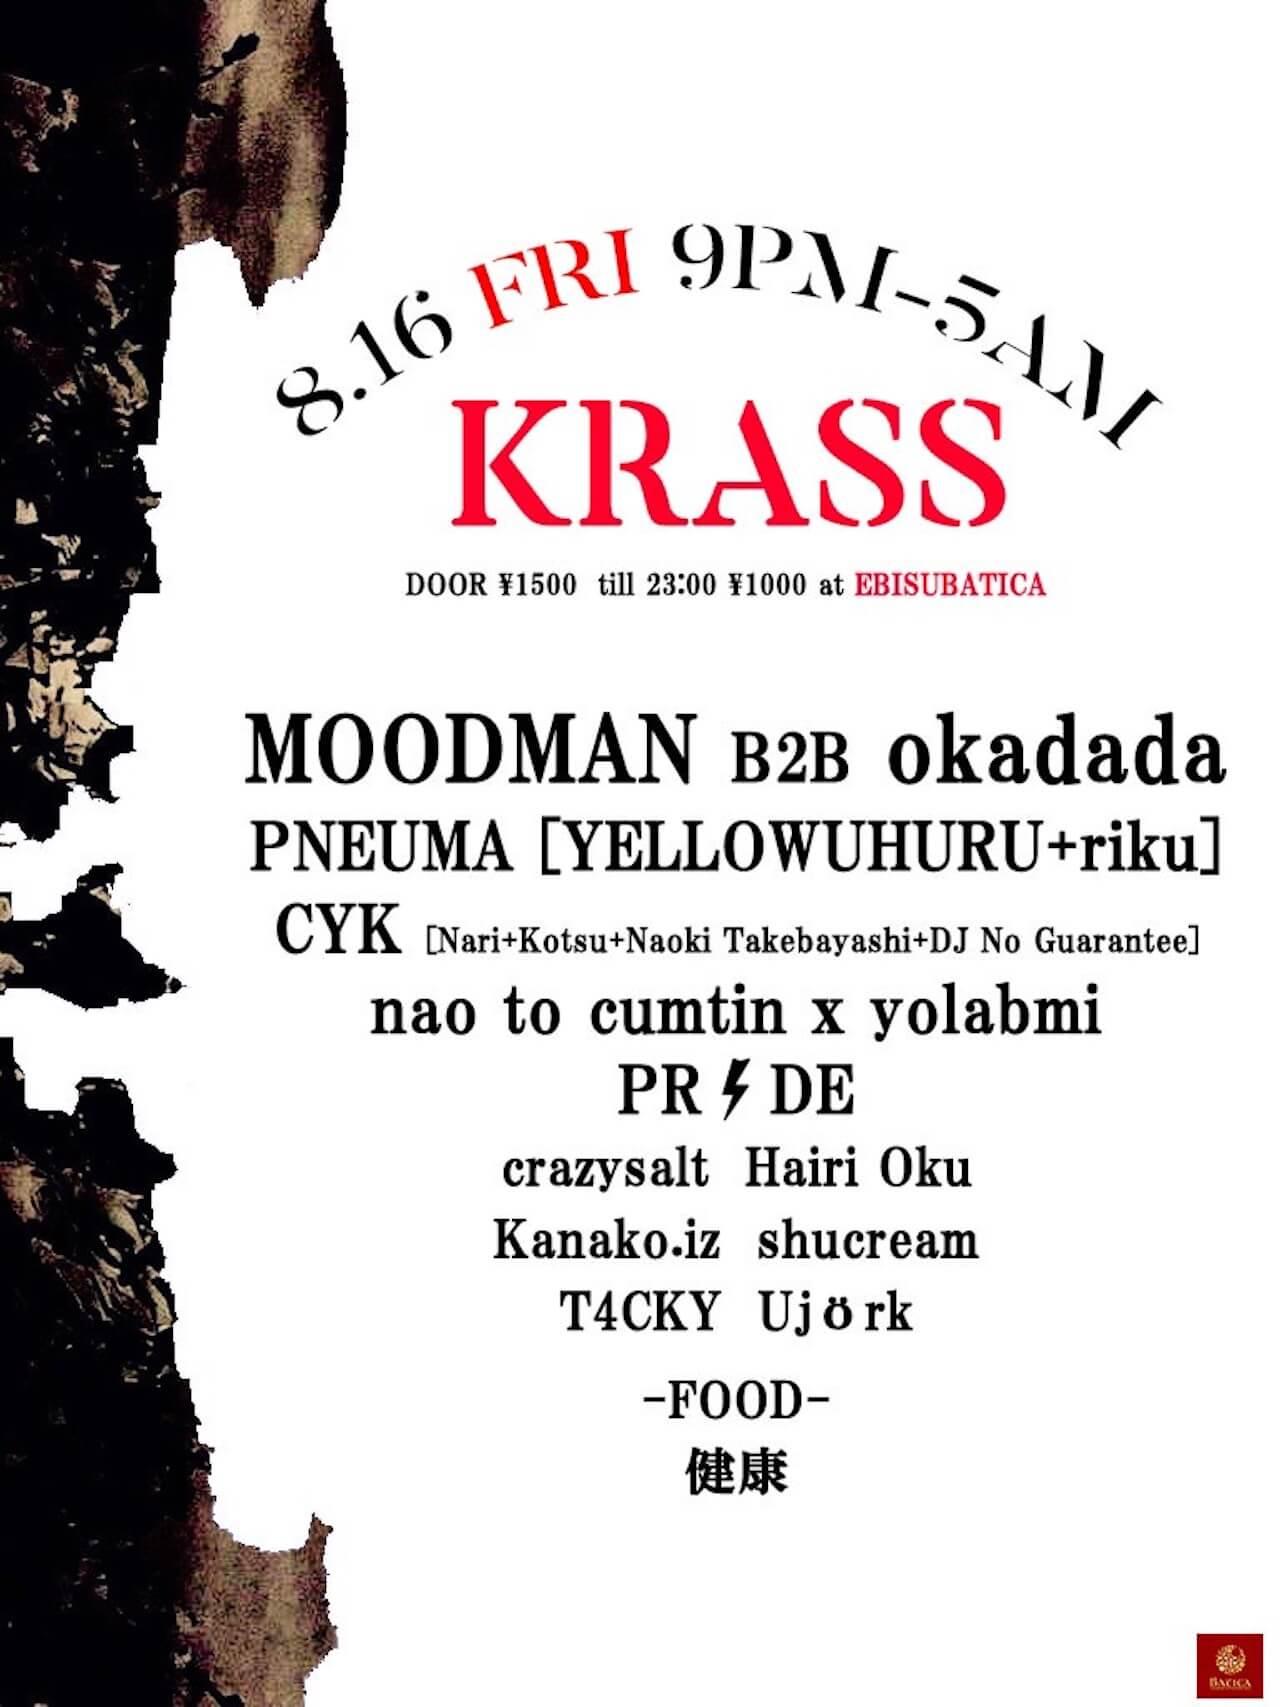 MOODMAN × okadadaのB2B、PNEUMA、CYKらがダンス・フロア・サイエンスを深めるイベント<KRASS>が開催 music190812-KRASS